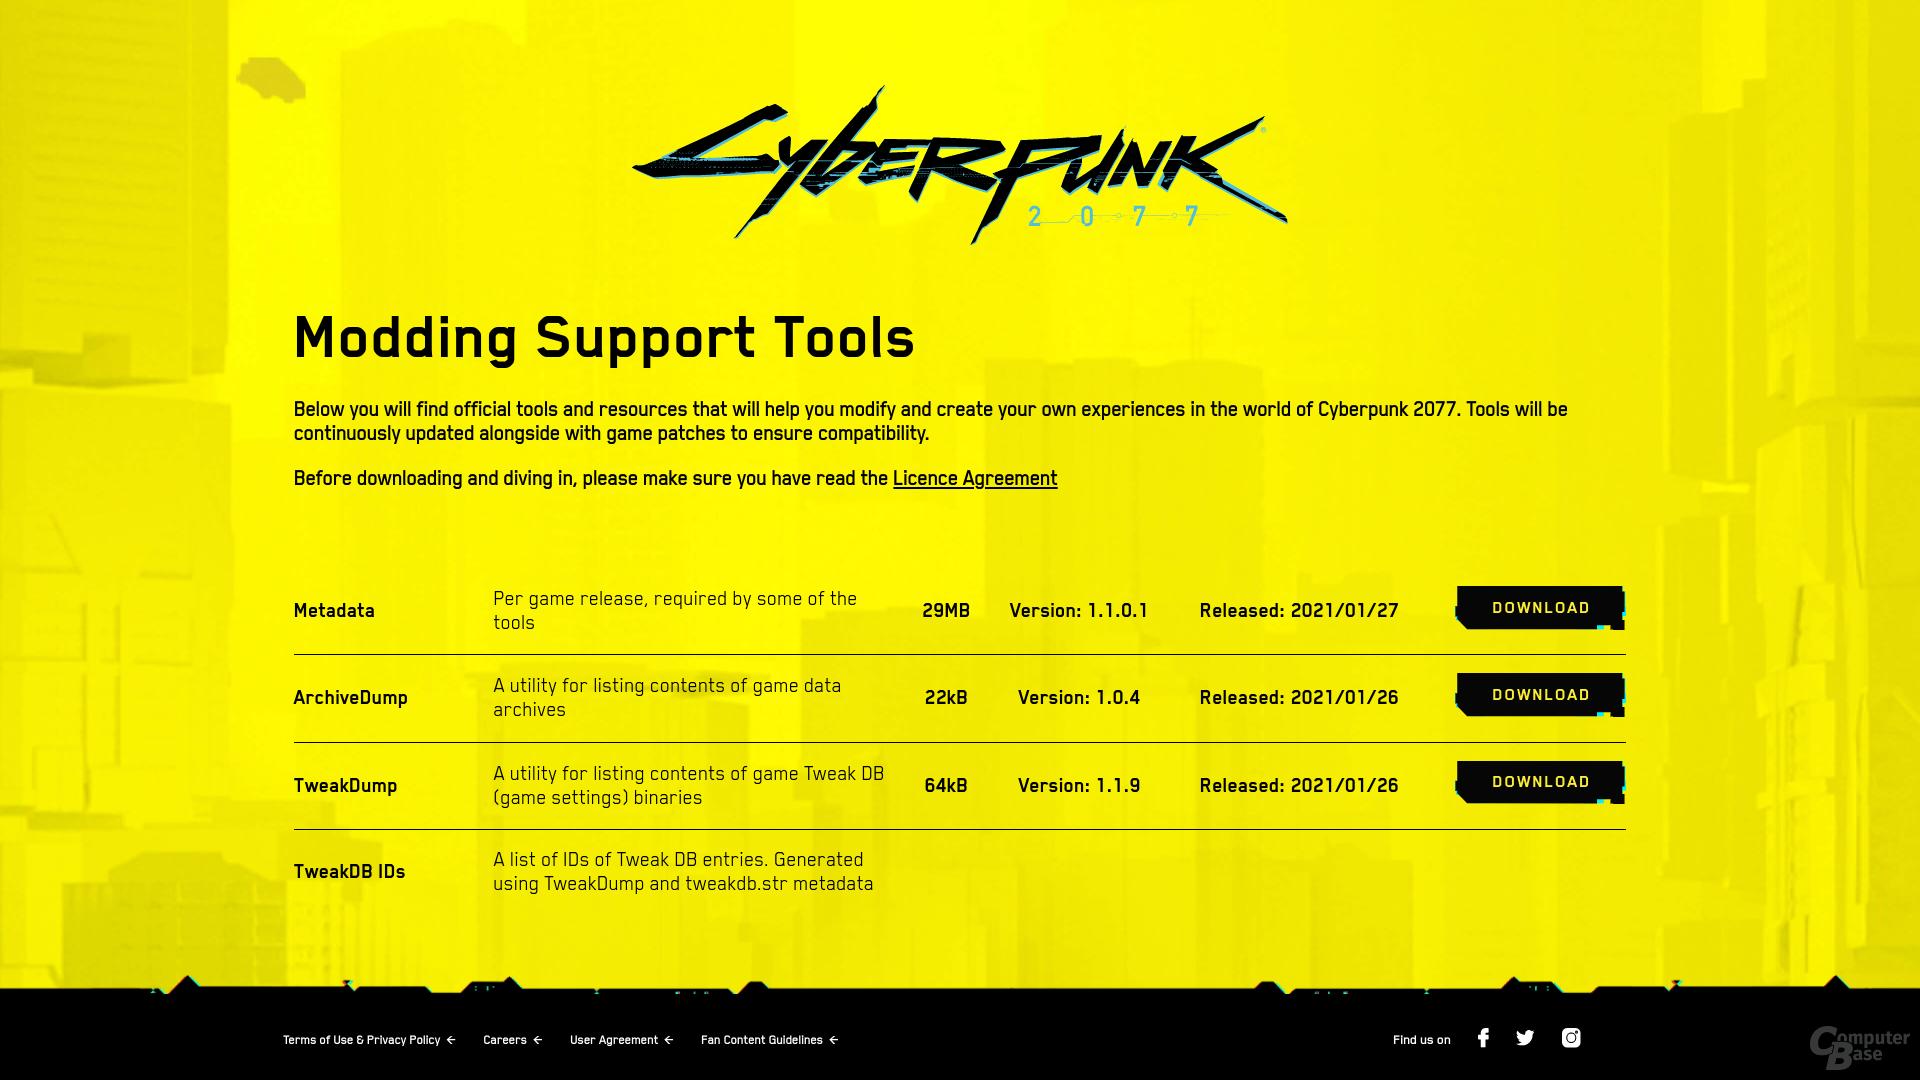 CD Projekt Red startet den offiziellen Modding-Support für Cyberpunk 2077